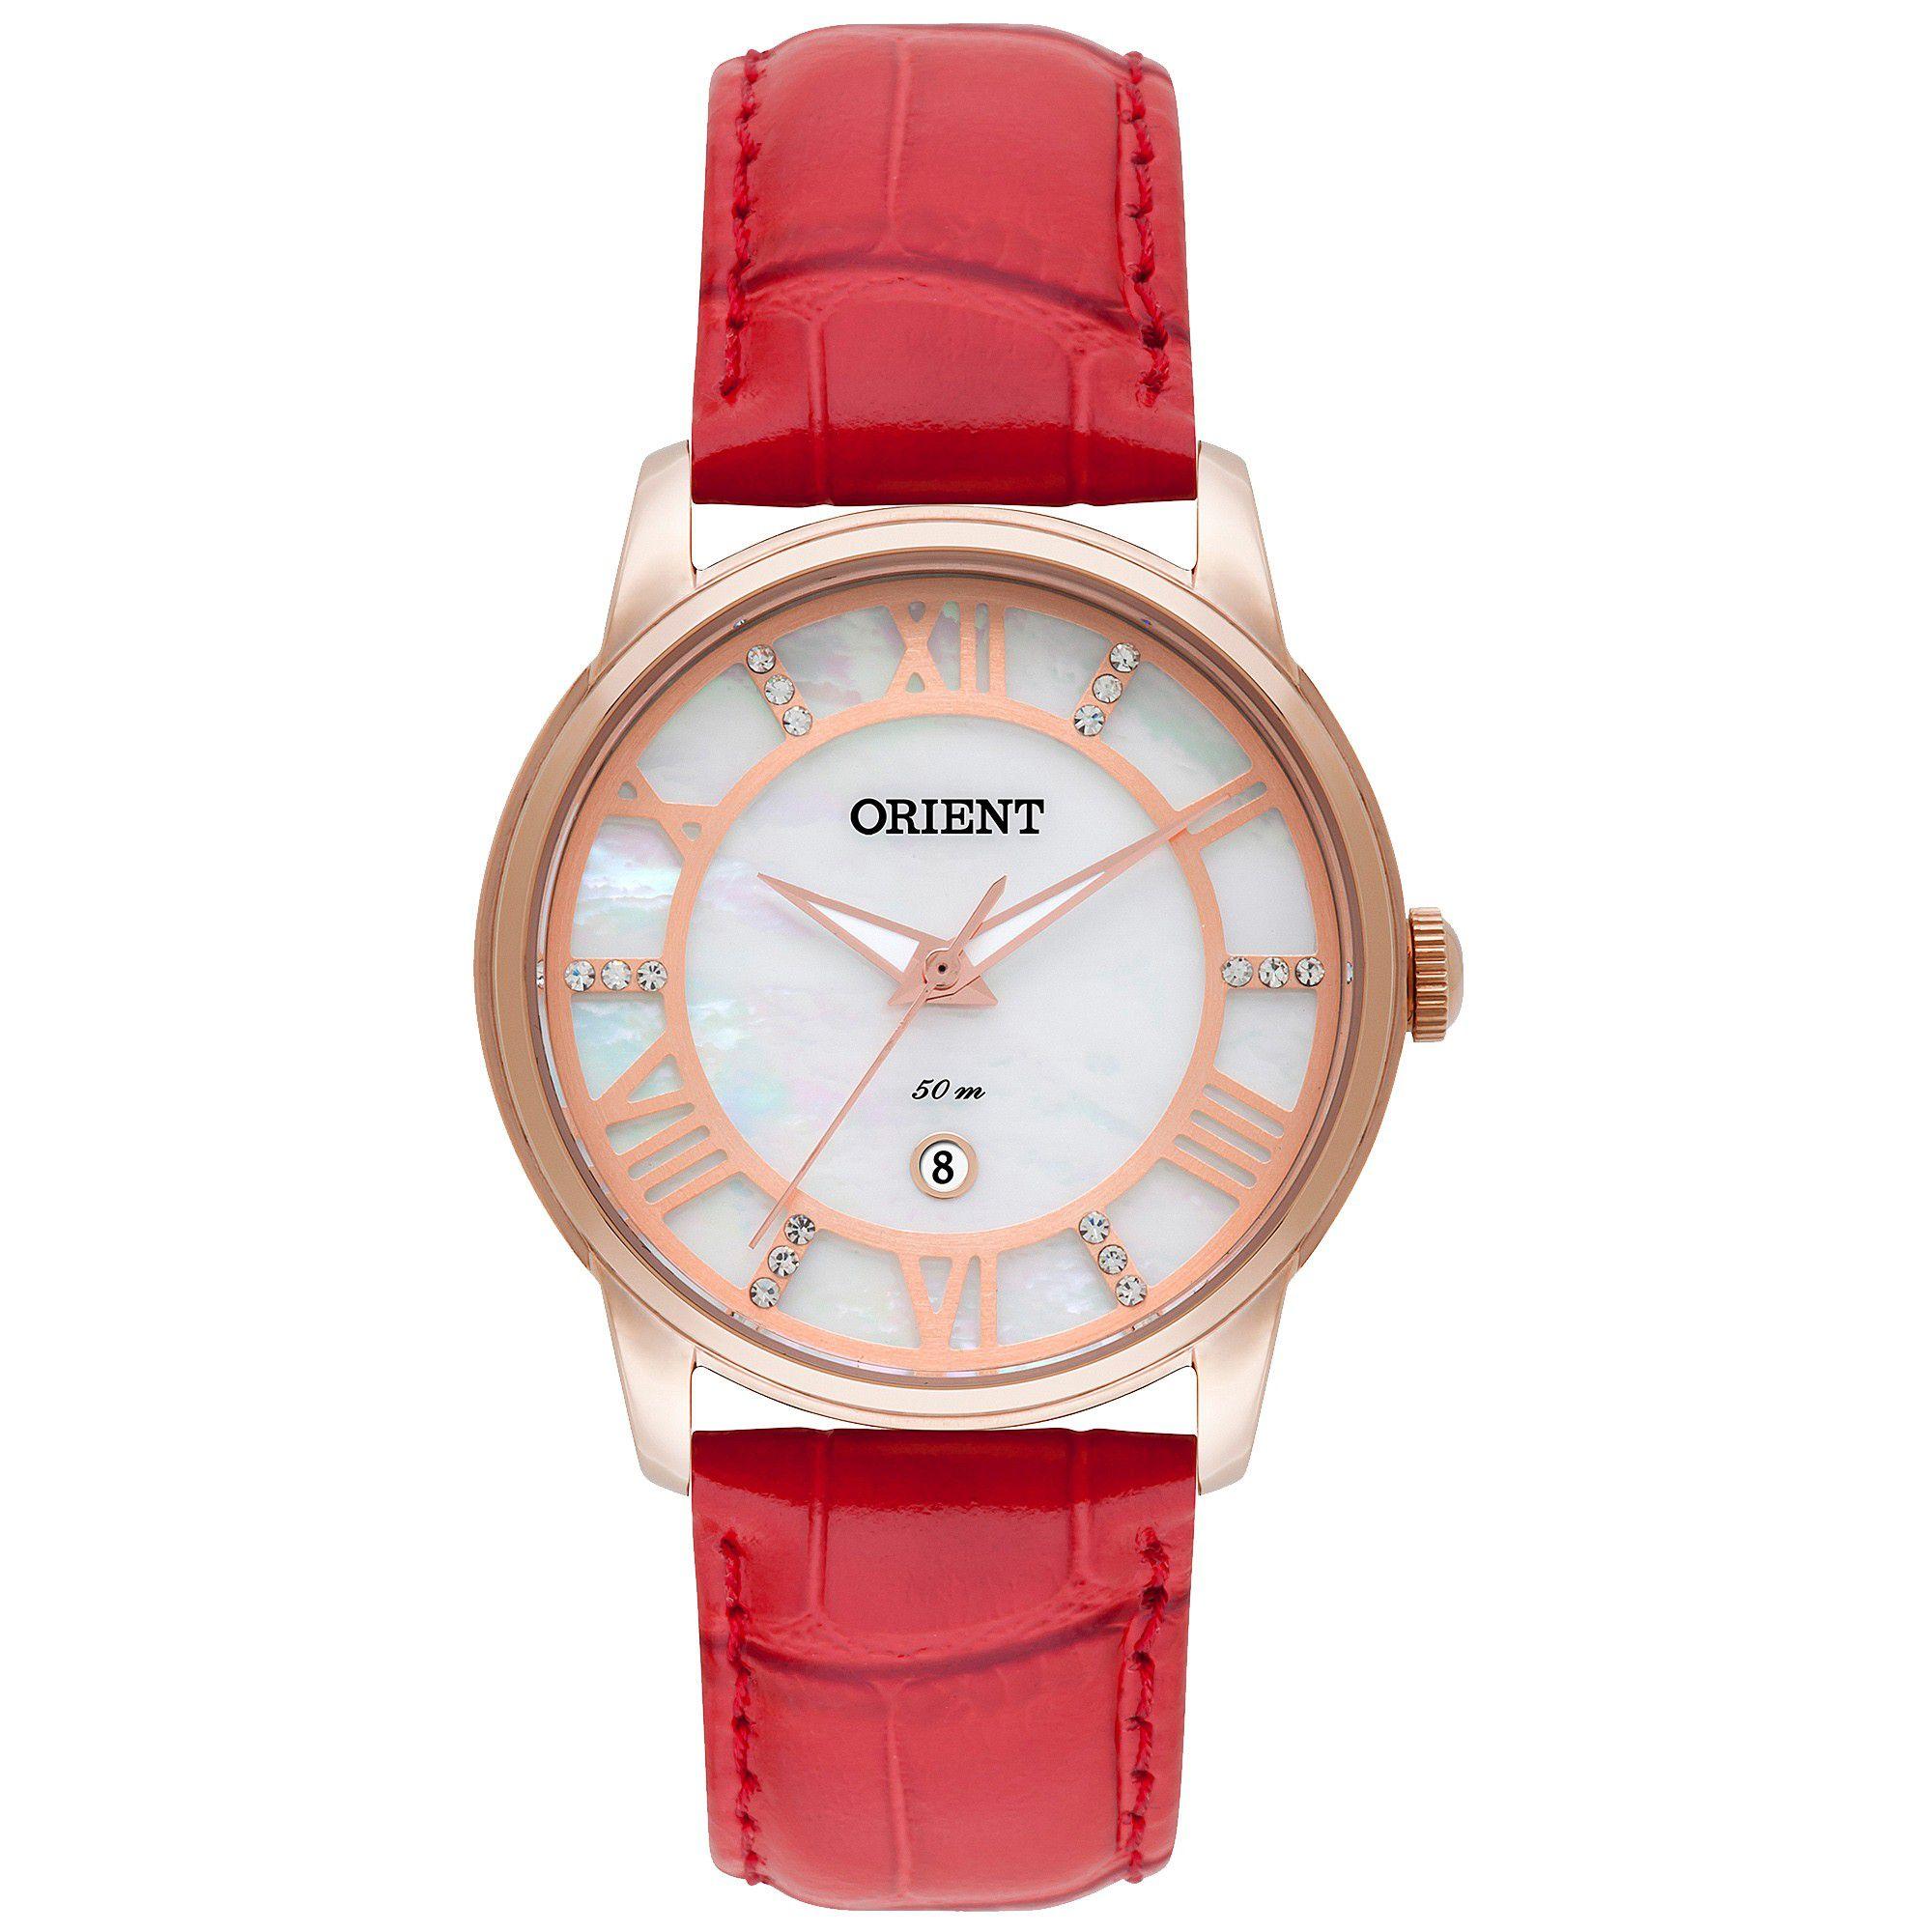 Relógio Feminino Orient FRSC1006 B3VX